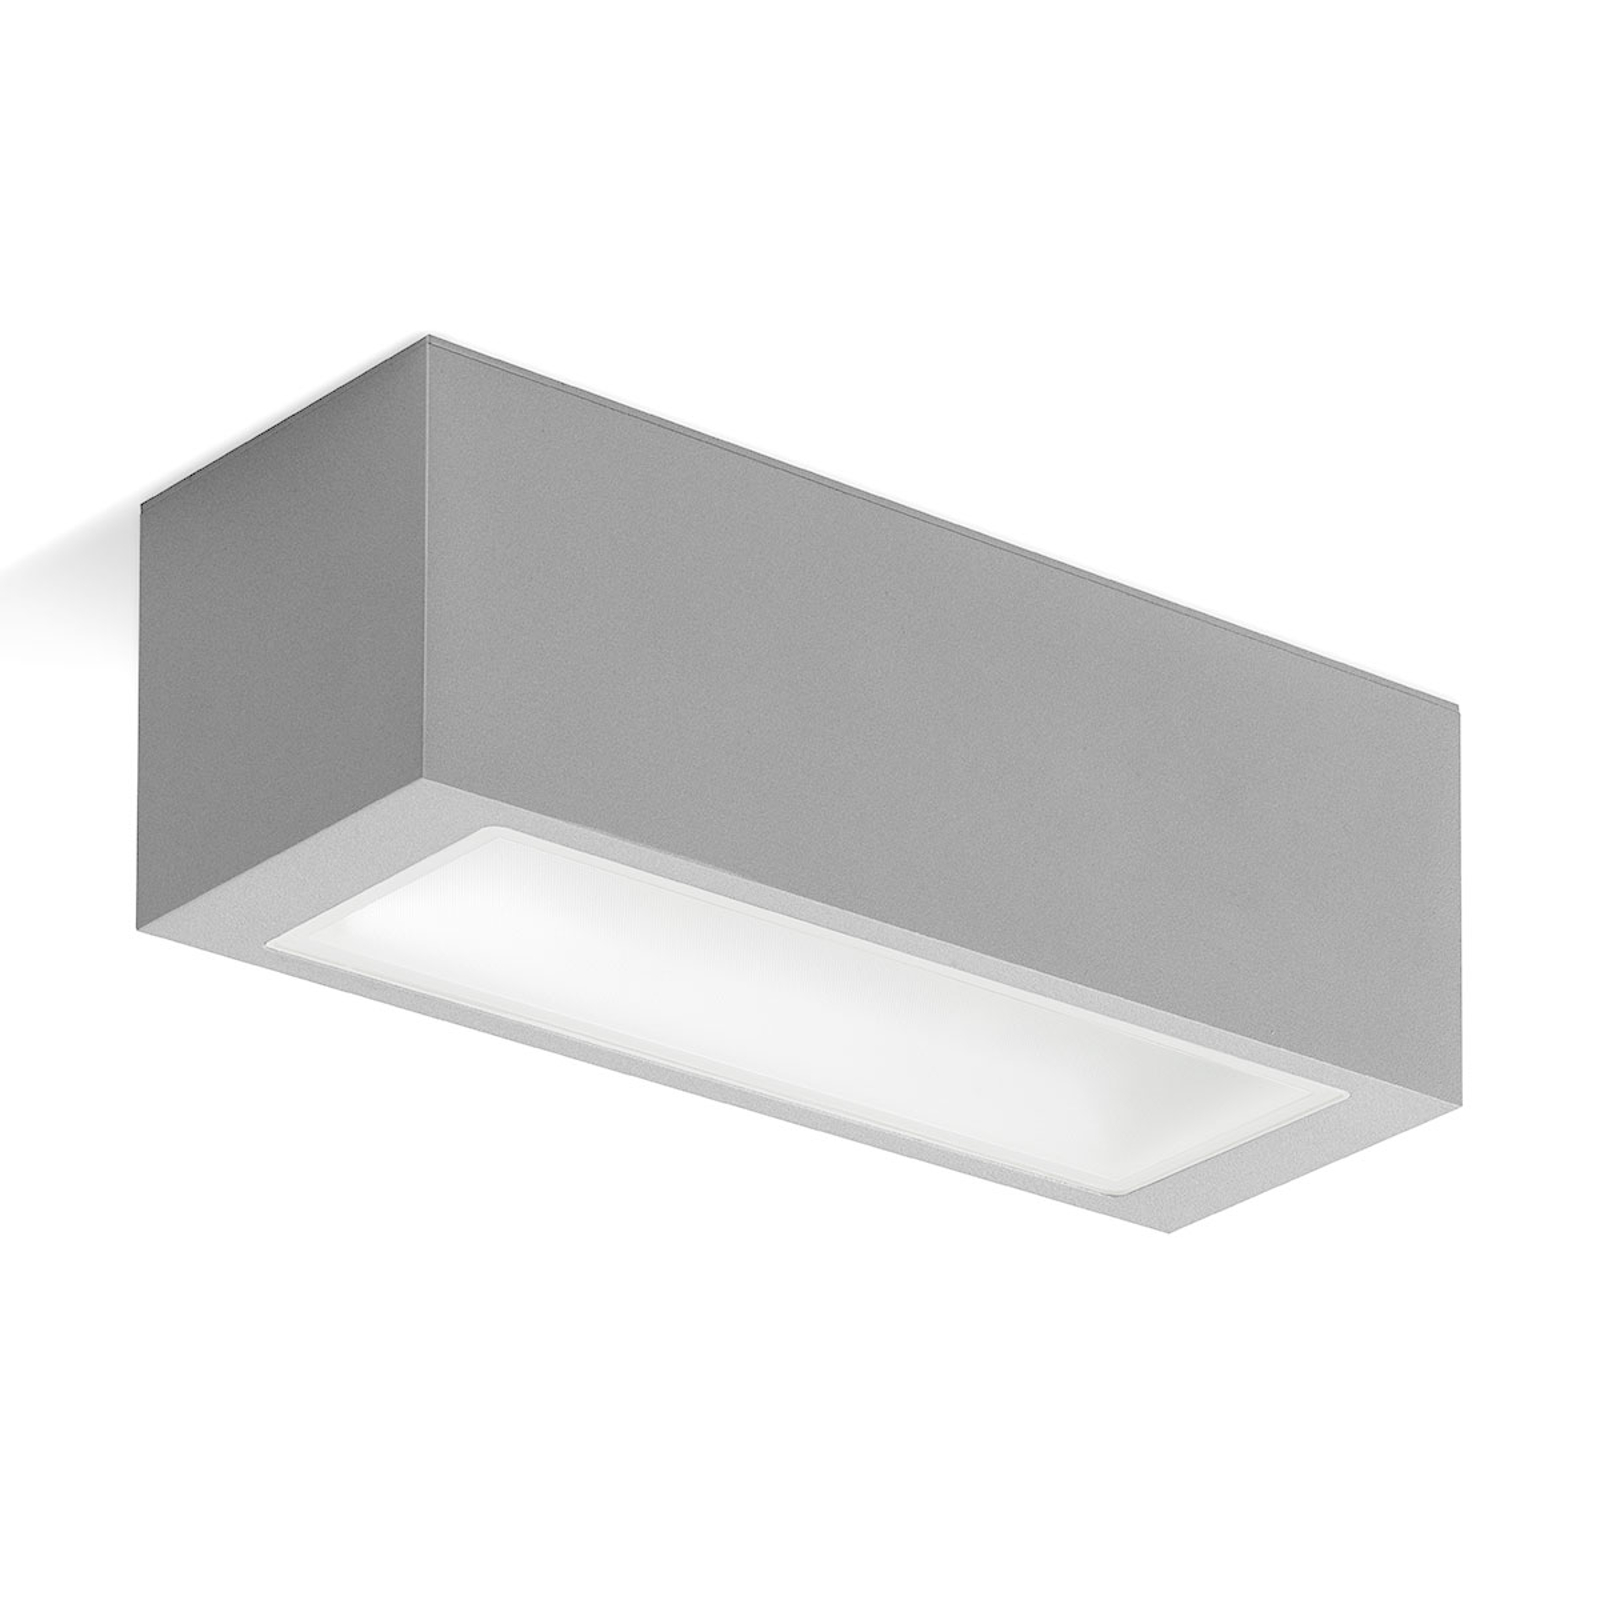 LED wandlamp 303559, optiek symmetrisch 4.000K